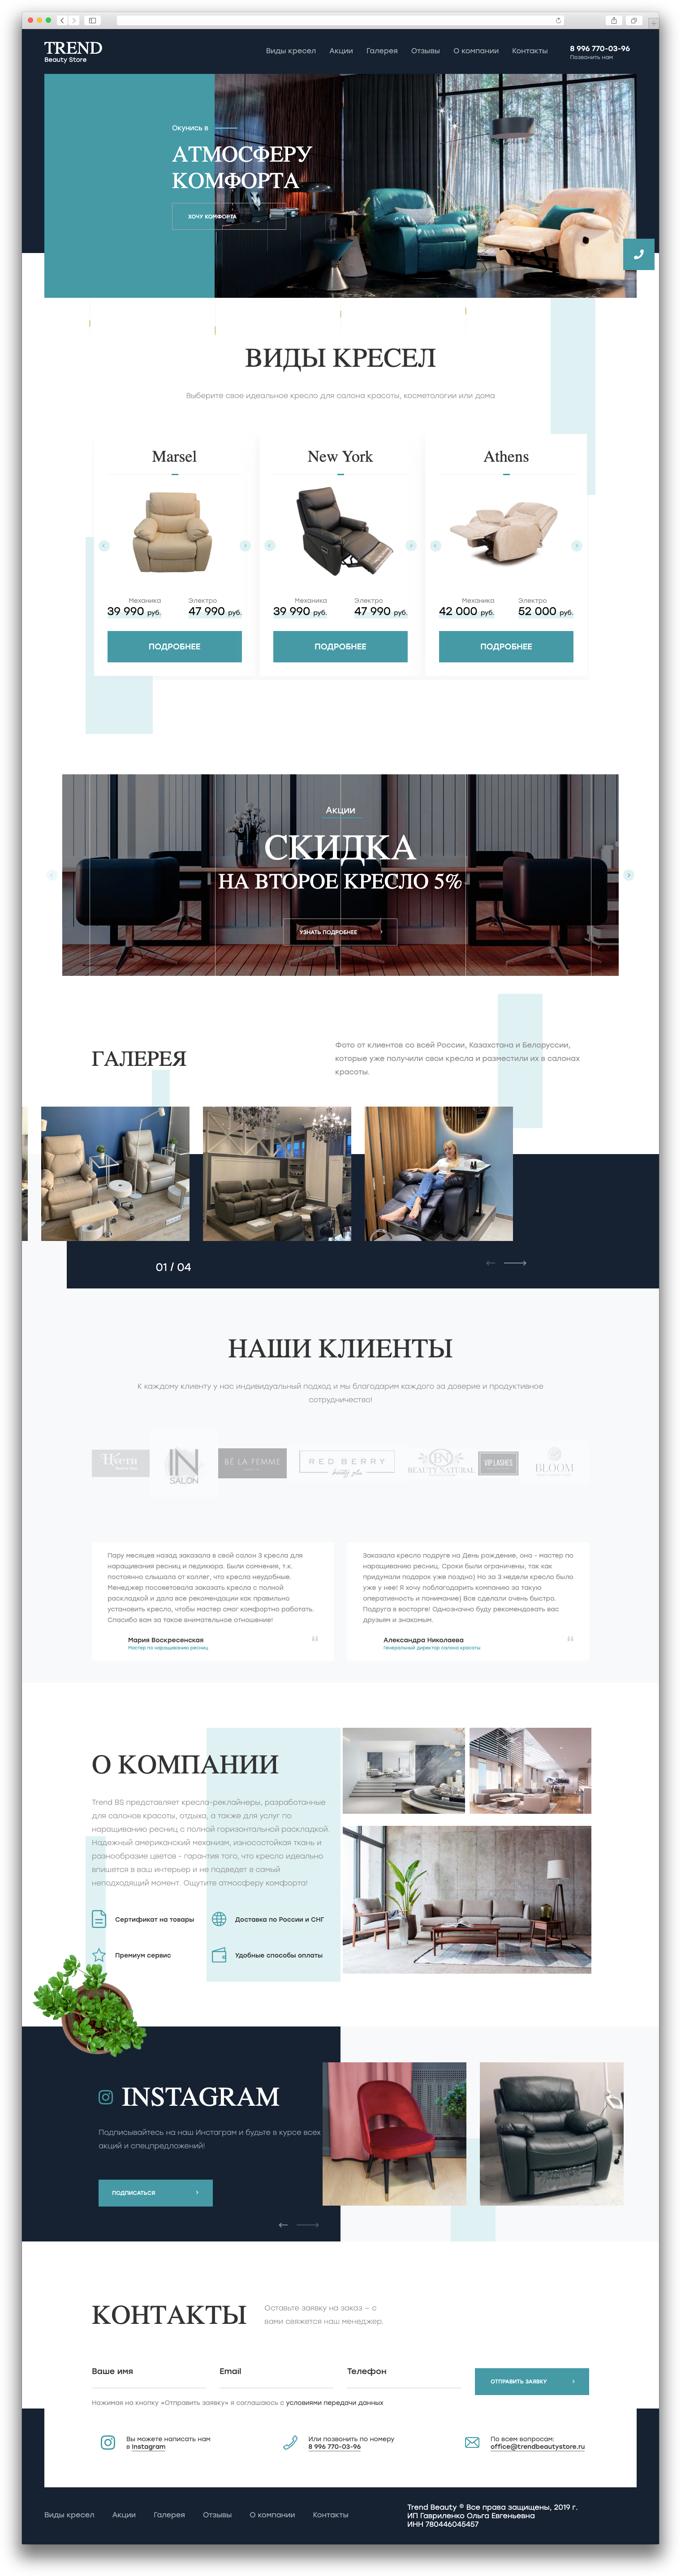 Доработки по сайту TrendBeautyStore.ru (WordPress)